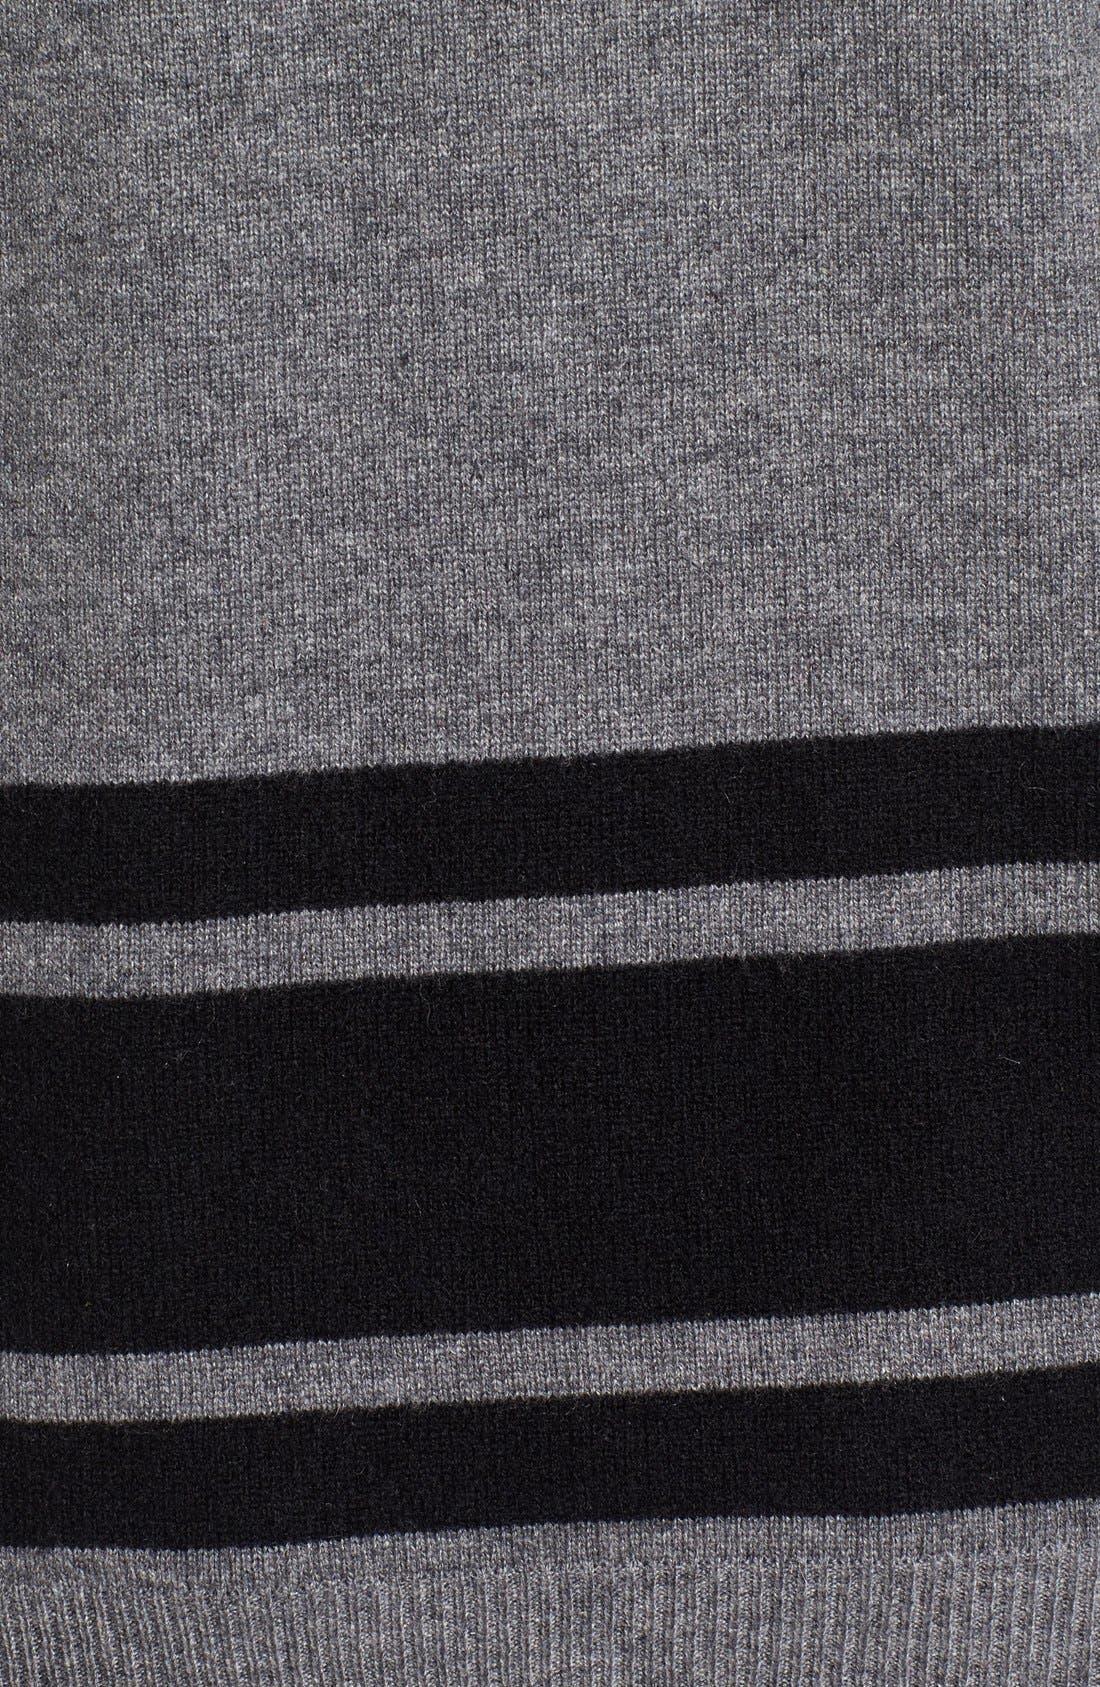 Stripe Wool Blend Sweater,                             Alternate thumbnail 5, color,                             020